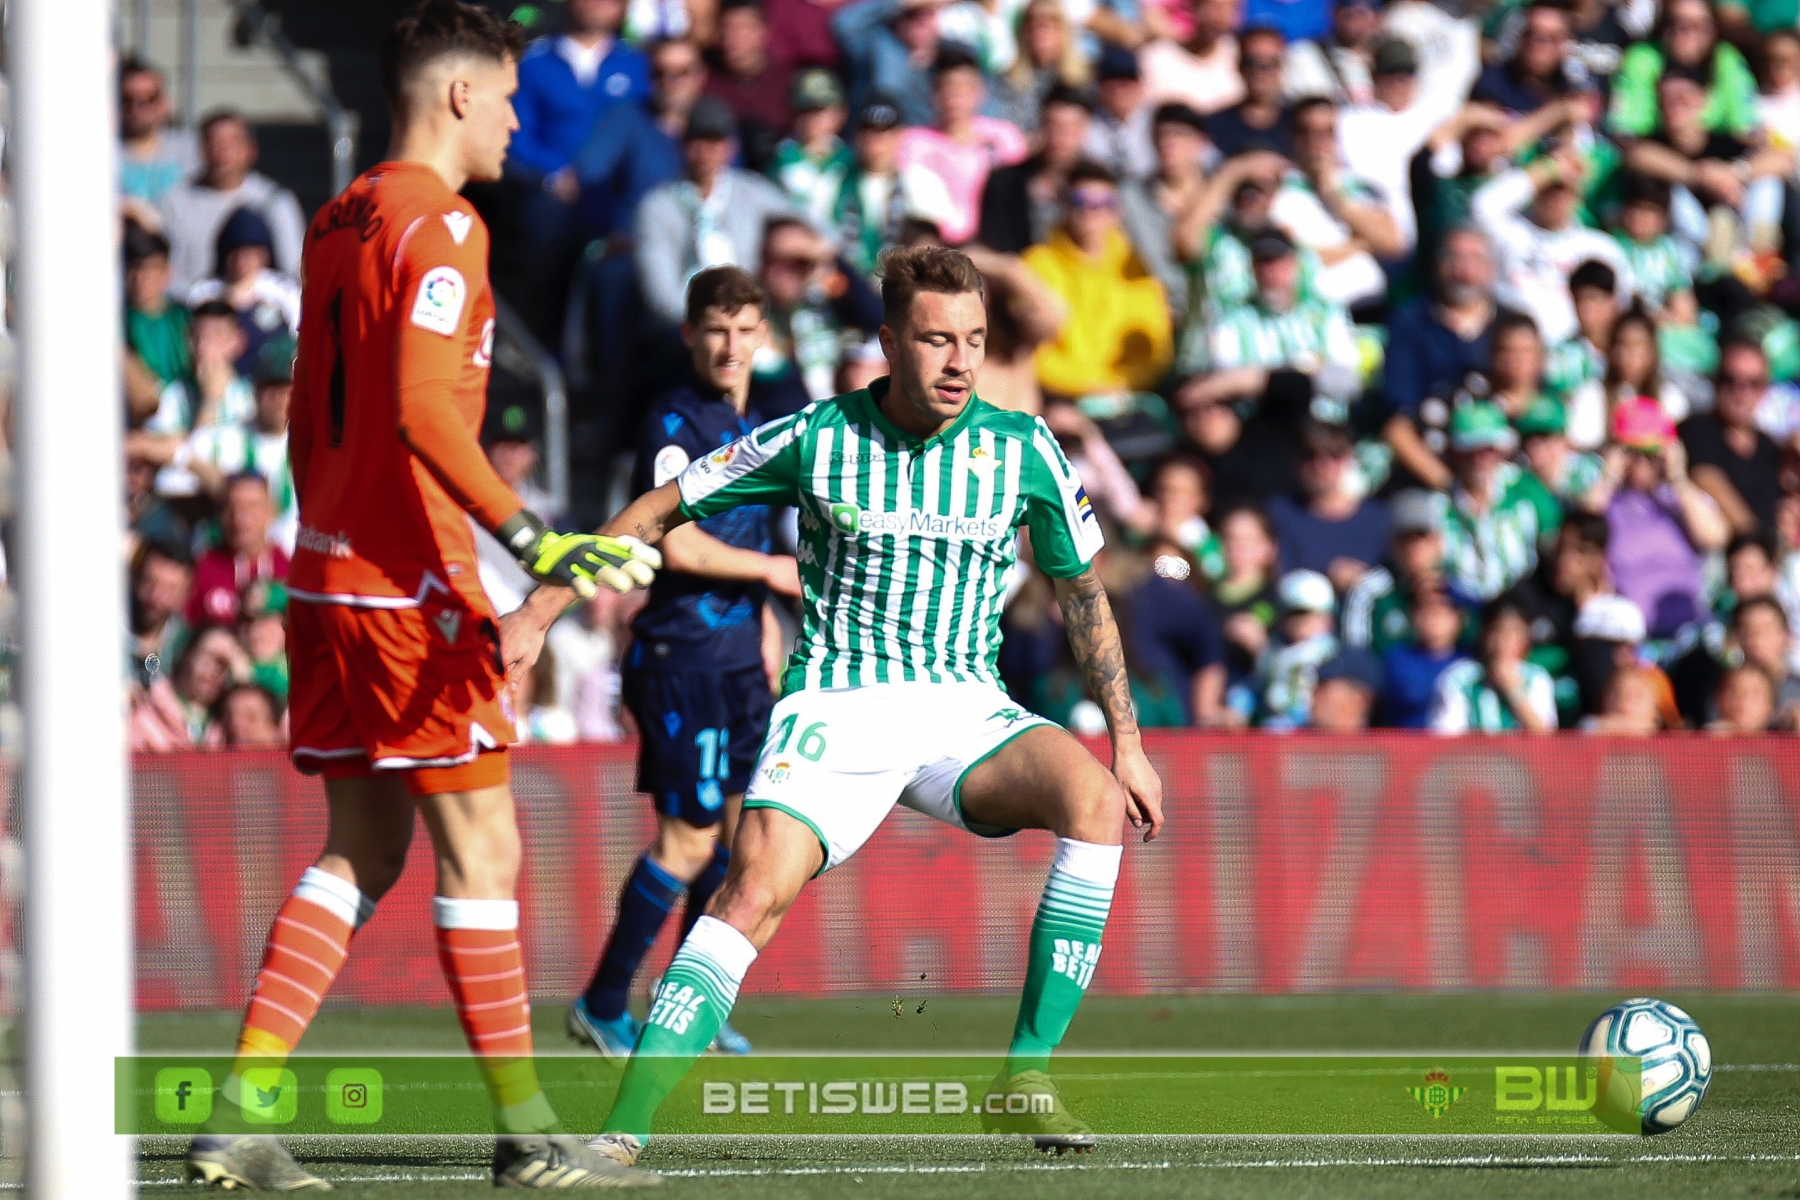 J20 Real Betis - Real Sociedad 43